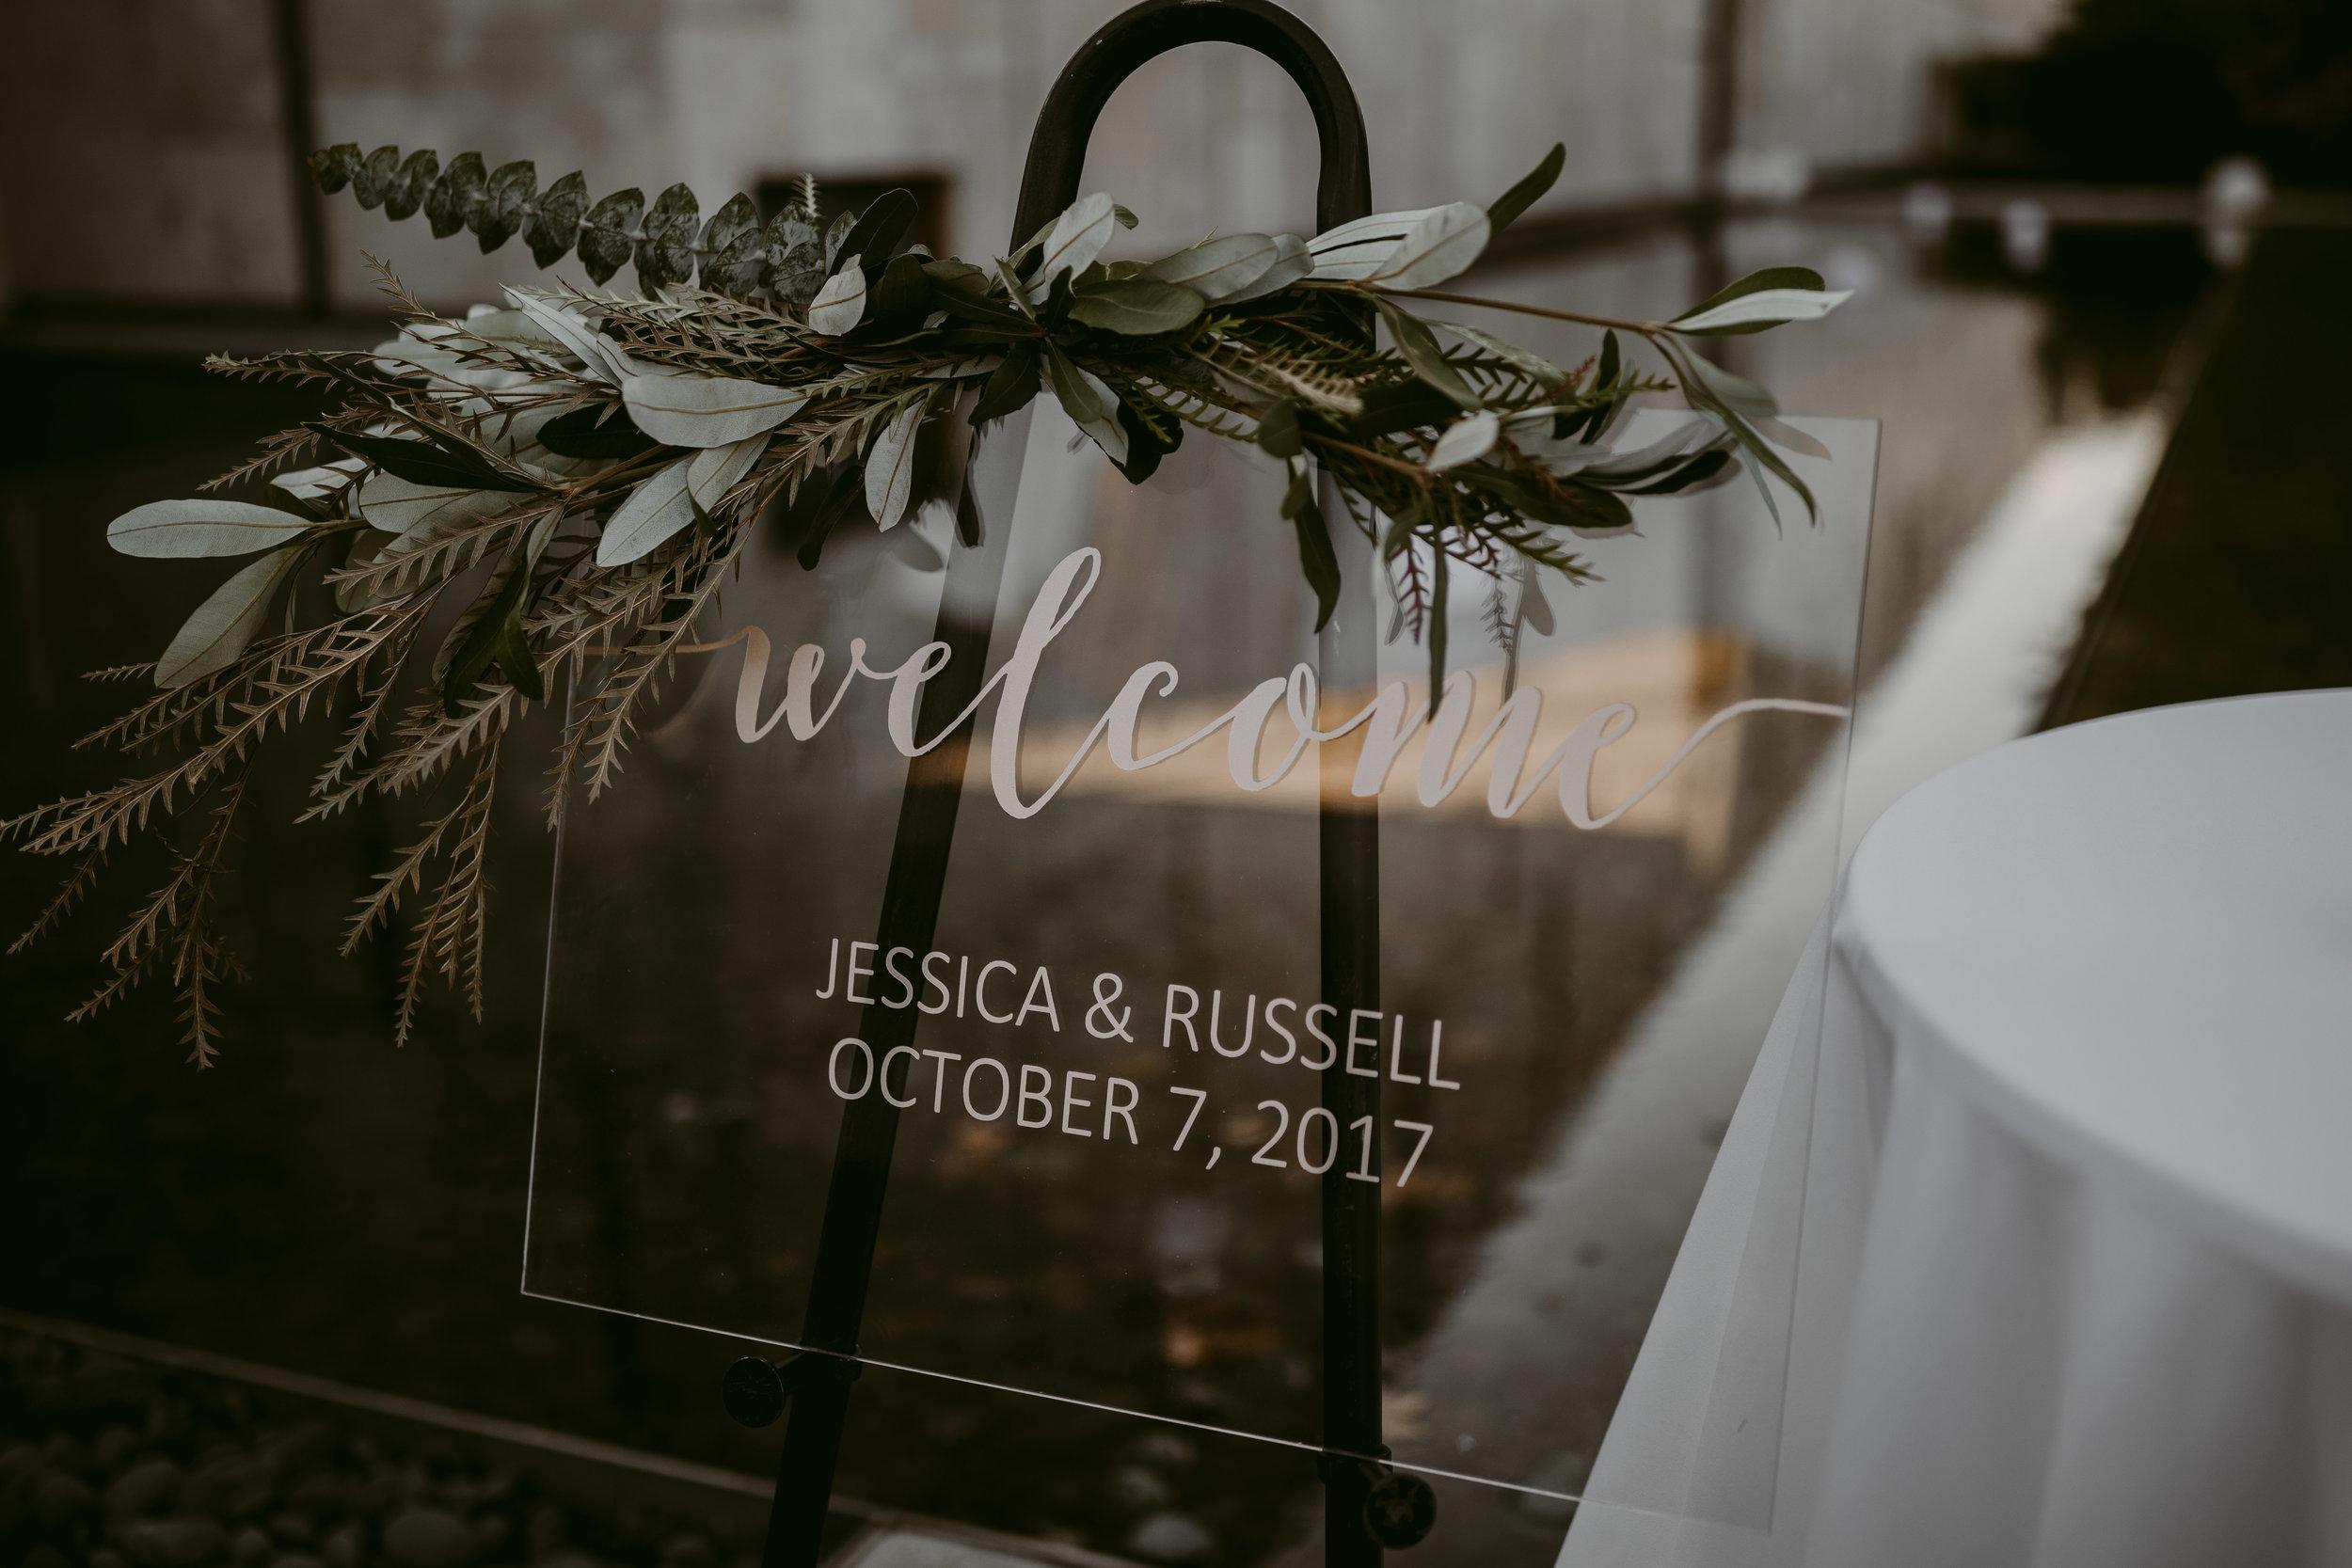 JessicaandRussell-OctoberWedding2017-4(89of144).jpg